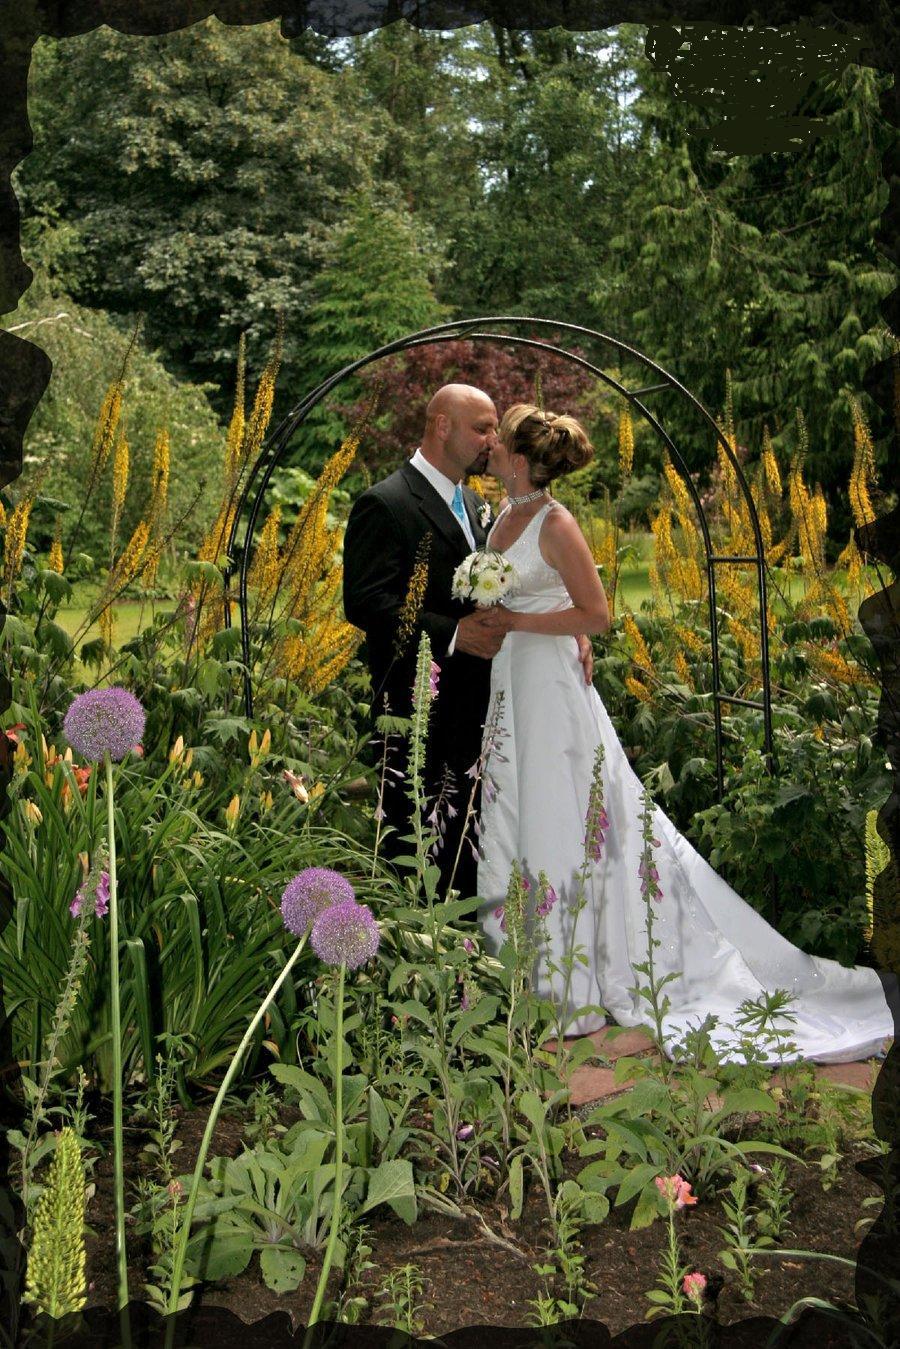 Smart wedding ideas outdoor weddings for Outdoor wedding pics